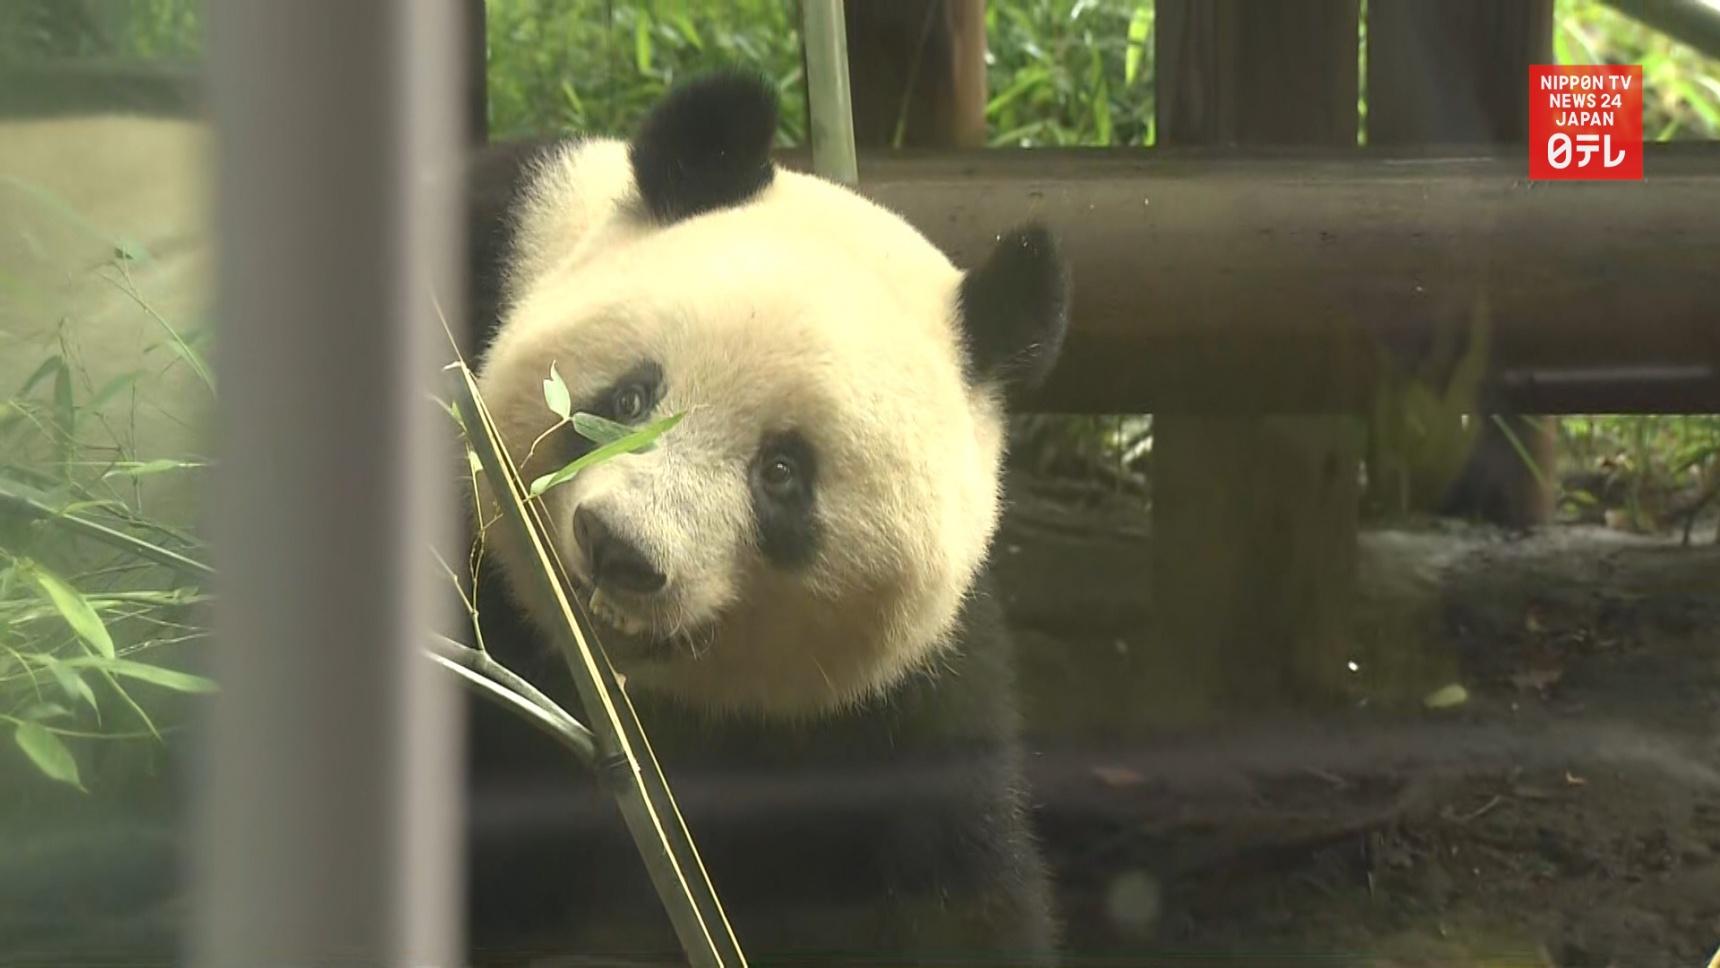 la star panda géant Xiang Xiang du zoo d'Ueno au Japon